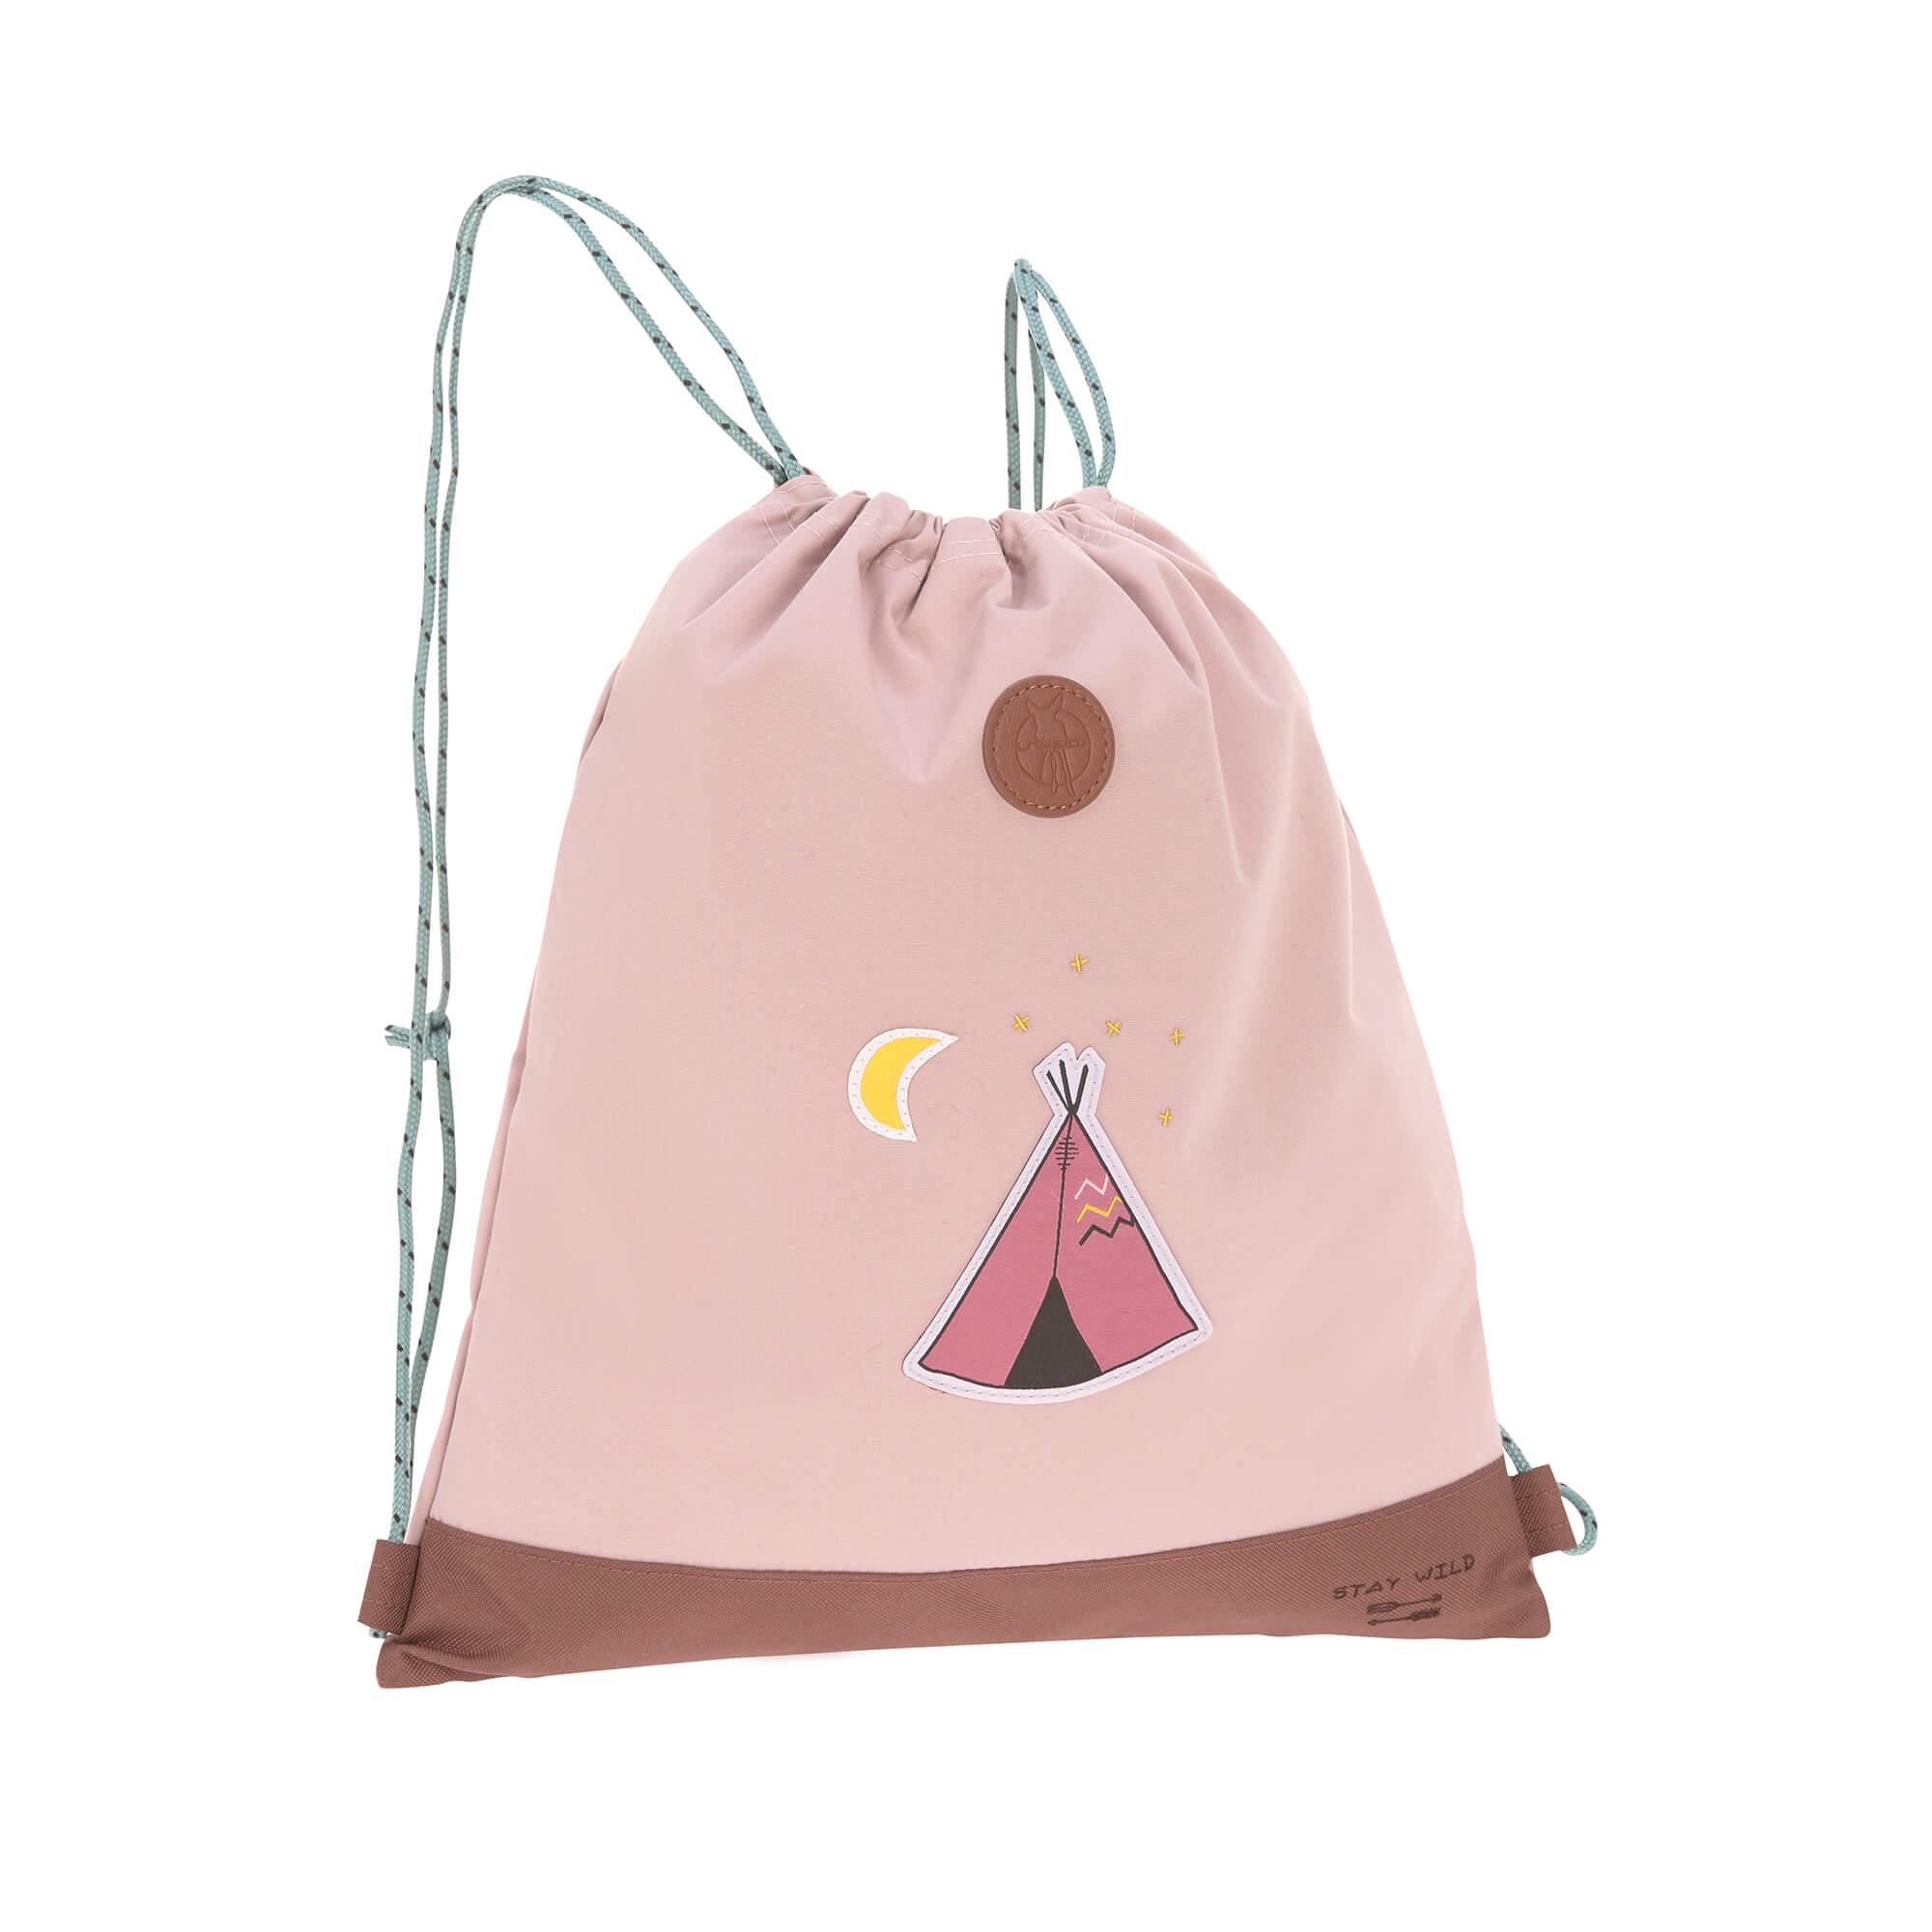 bbe4f924d3dc8 Lässig Turnbeutel - Mini String Bag Adventure Tipi